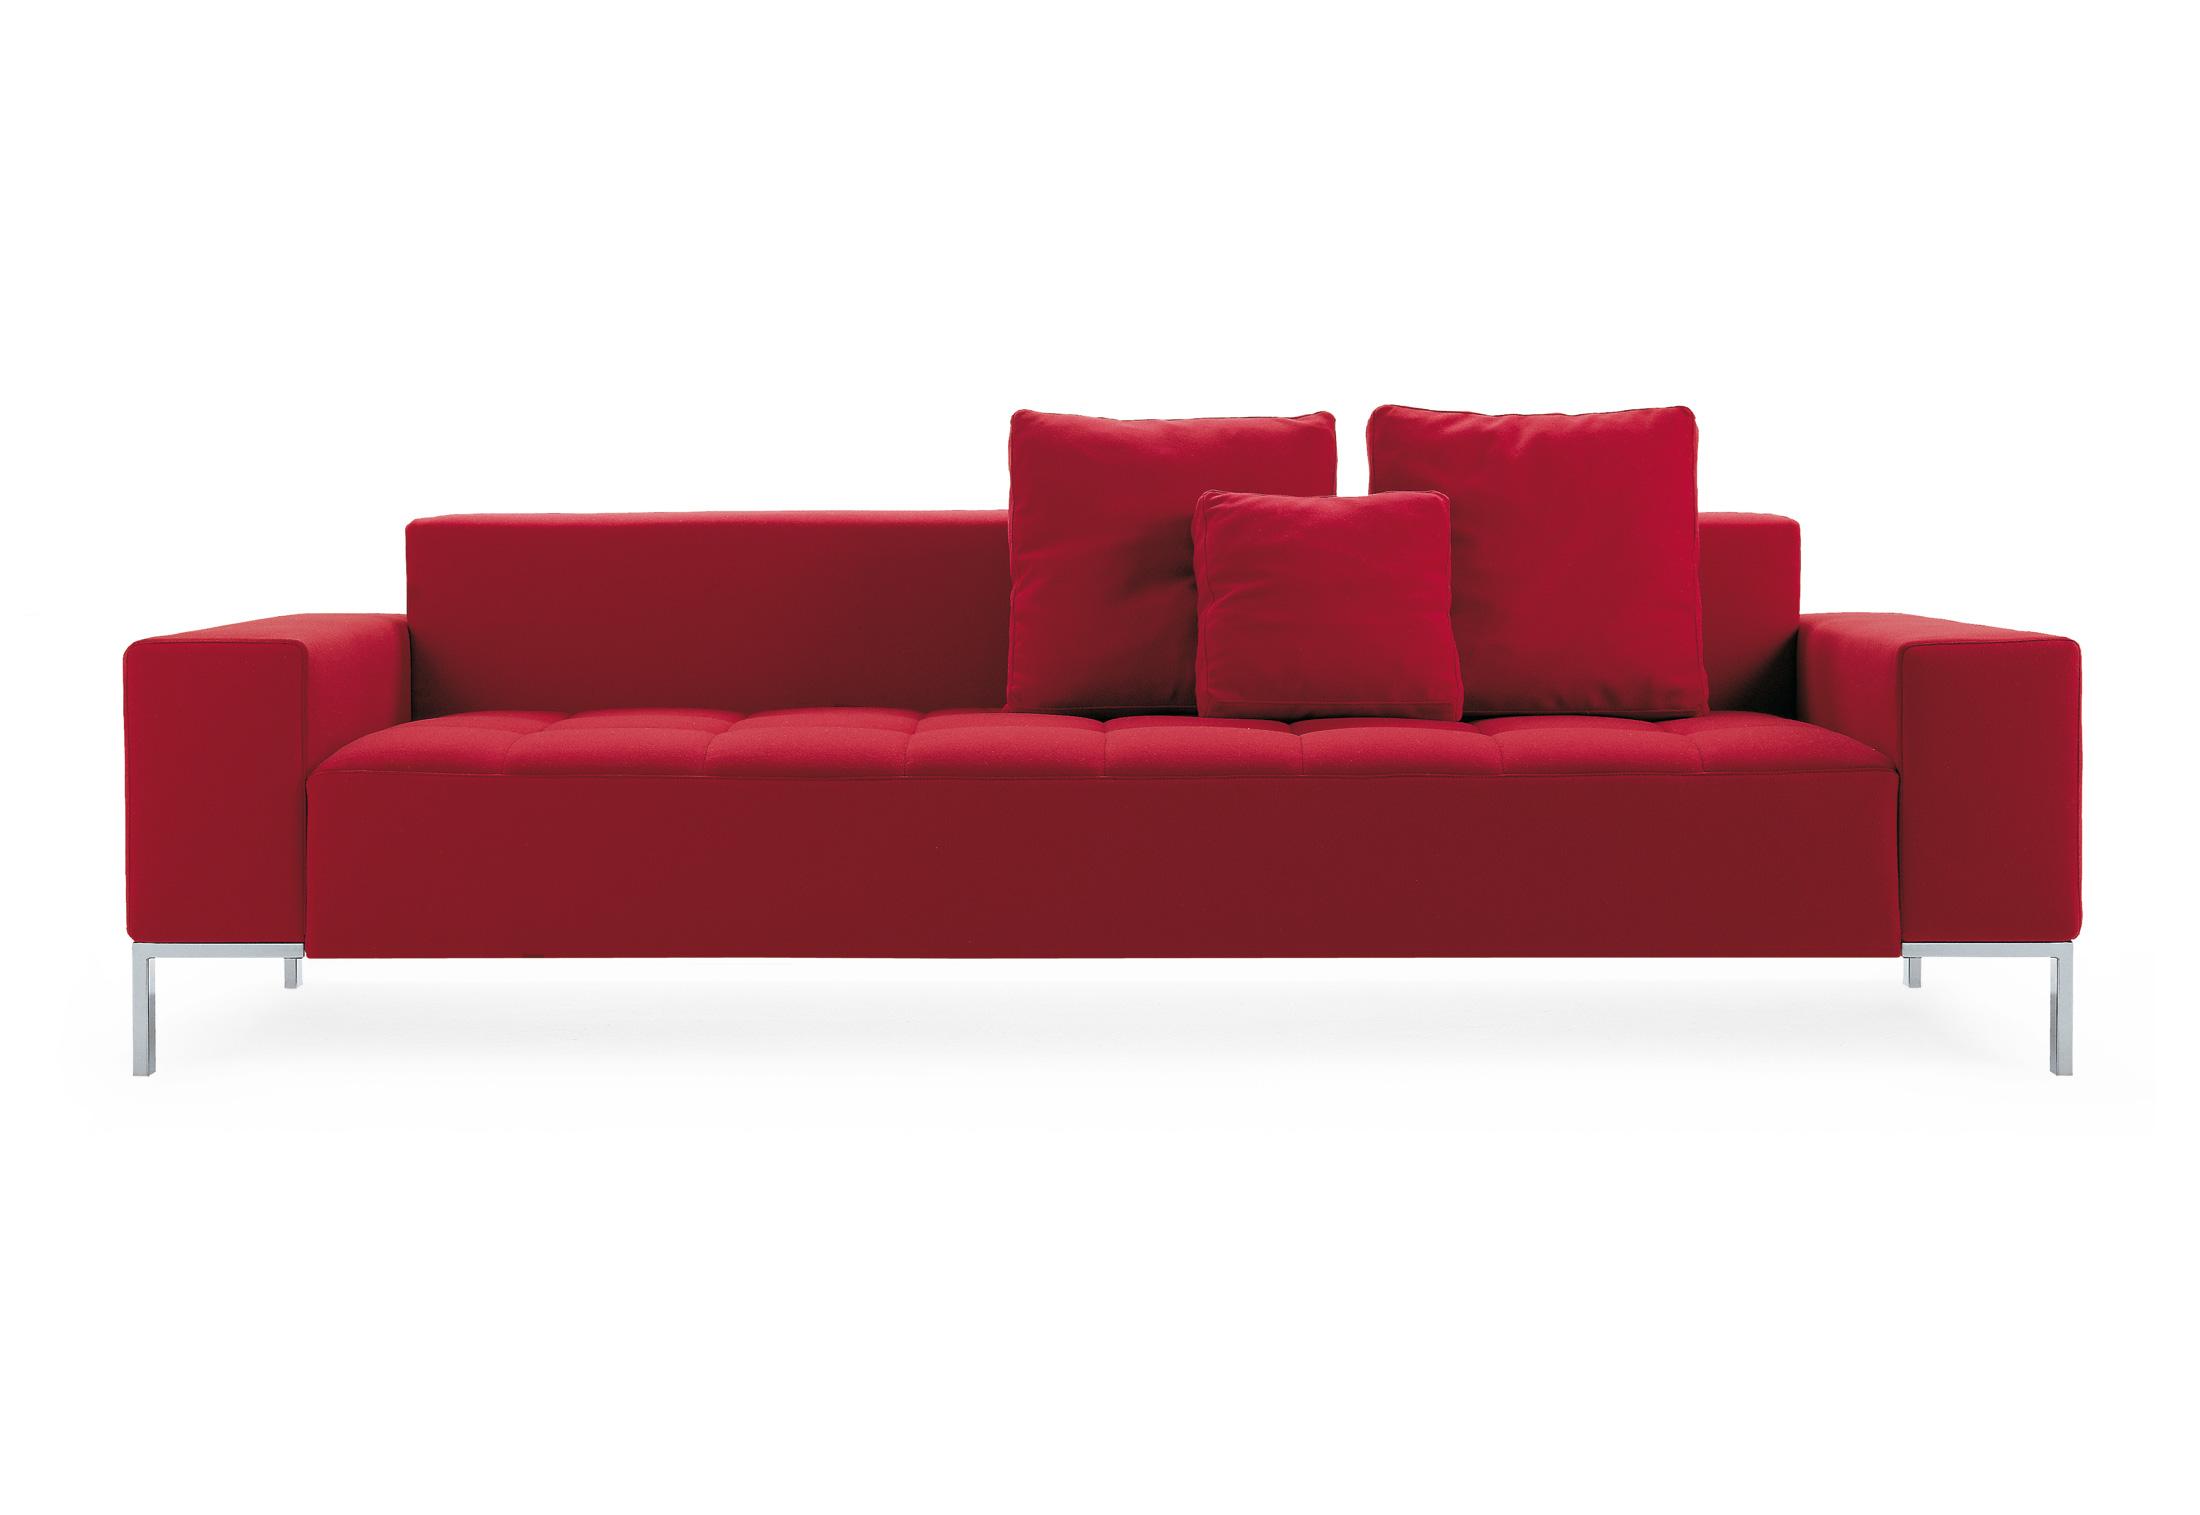 zanotta sofa bed sectional online india 1326 alfa by stylepark thesofa